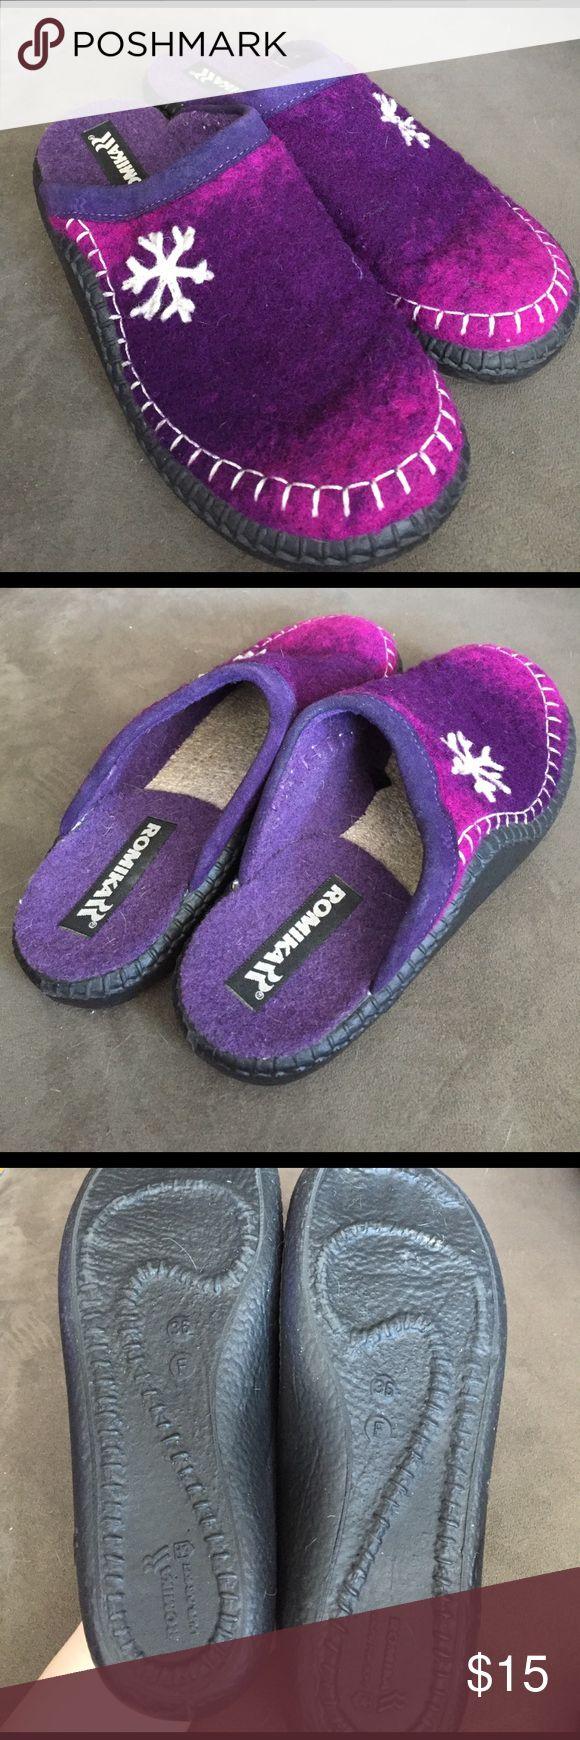 Romika purple winter slipper shoes EUC - warm wool - durable shoes romika Shoes Mules & Clogs